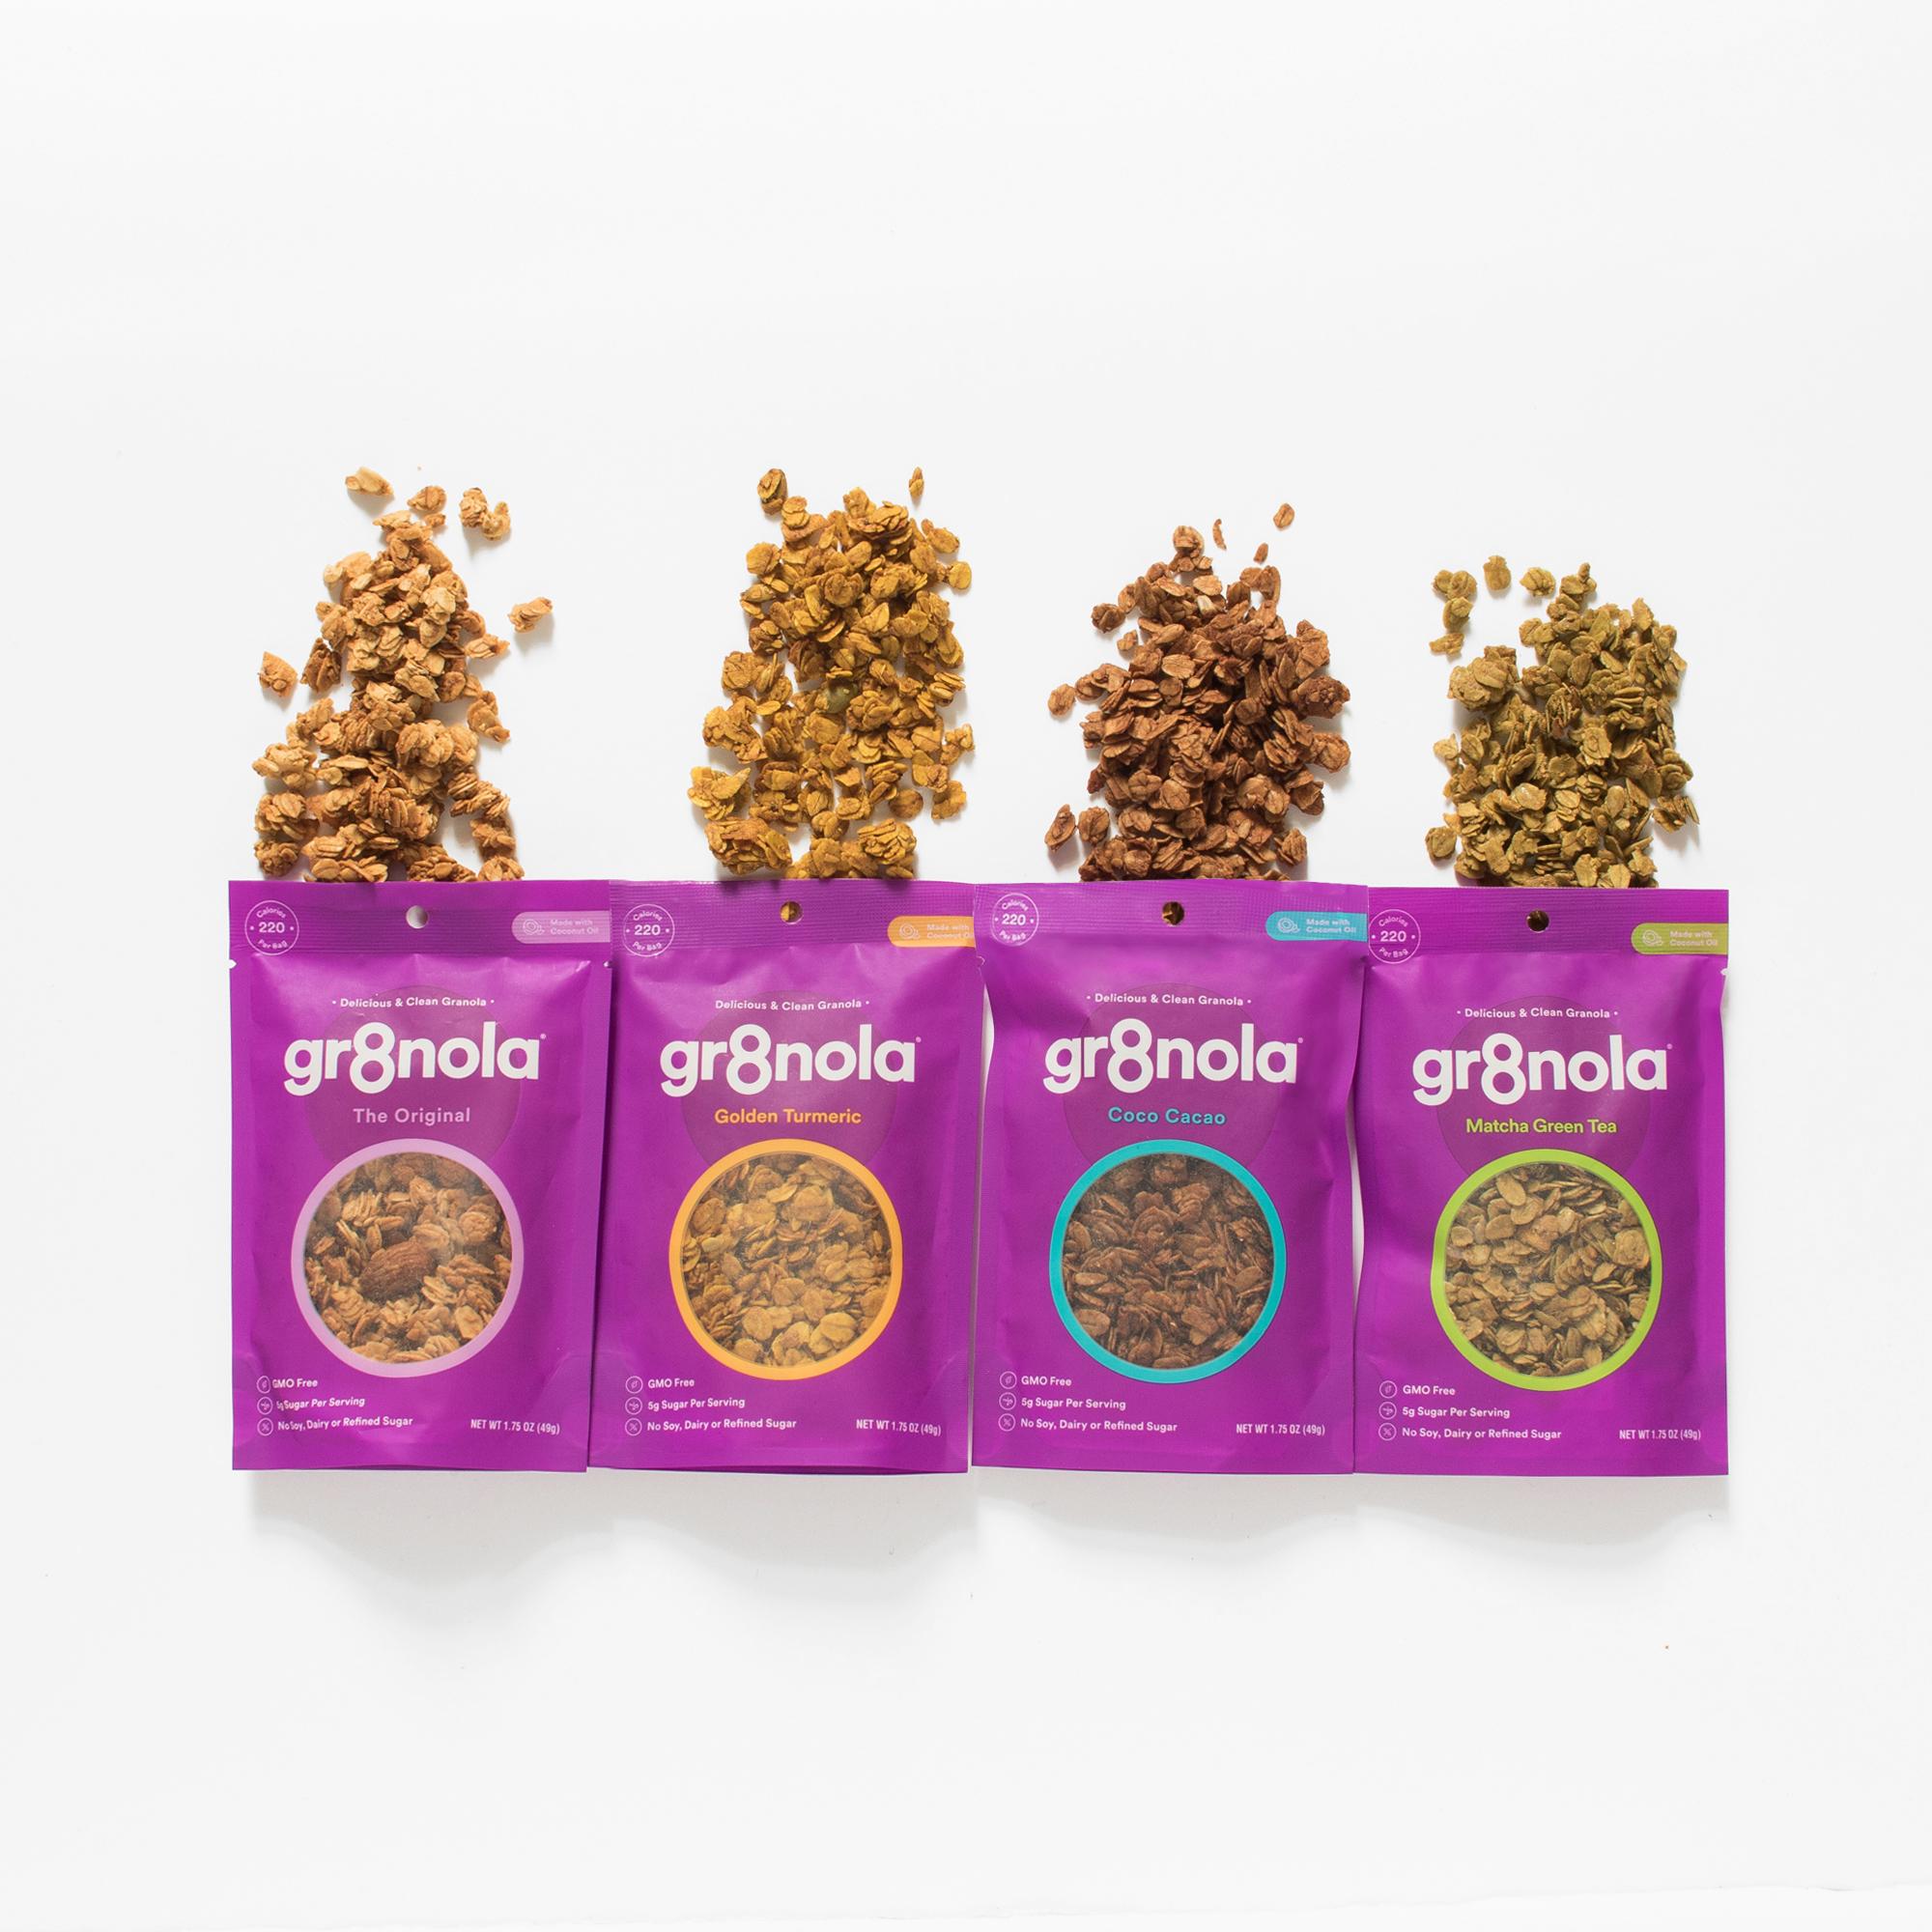 gr8nola granola, best granola, vegan, non gmo granola brands, online farmers market